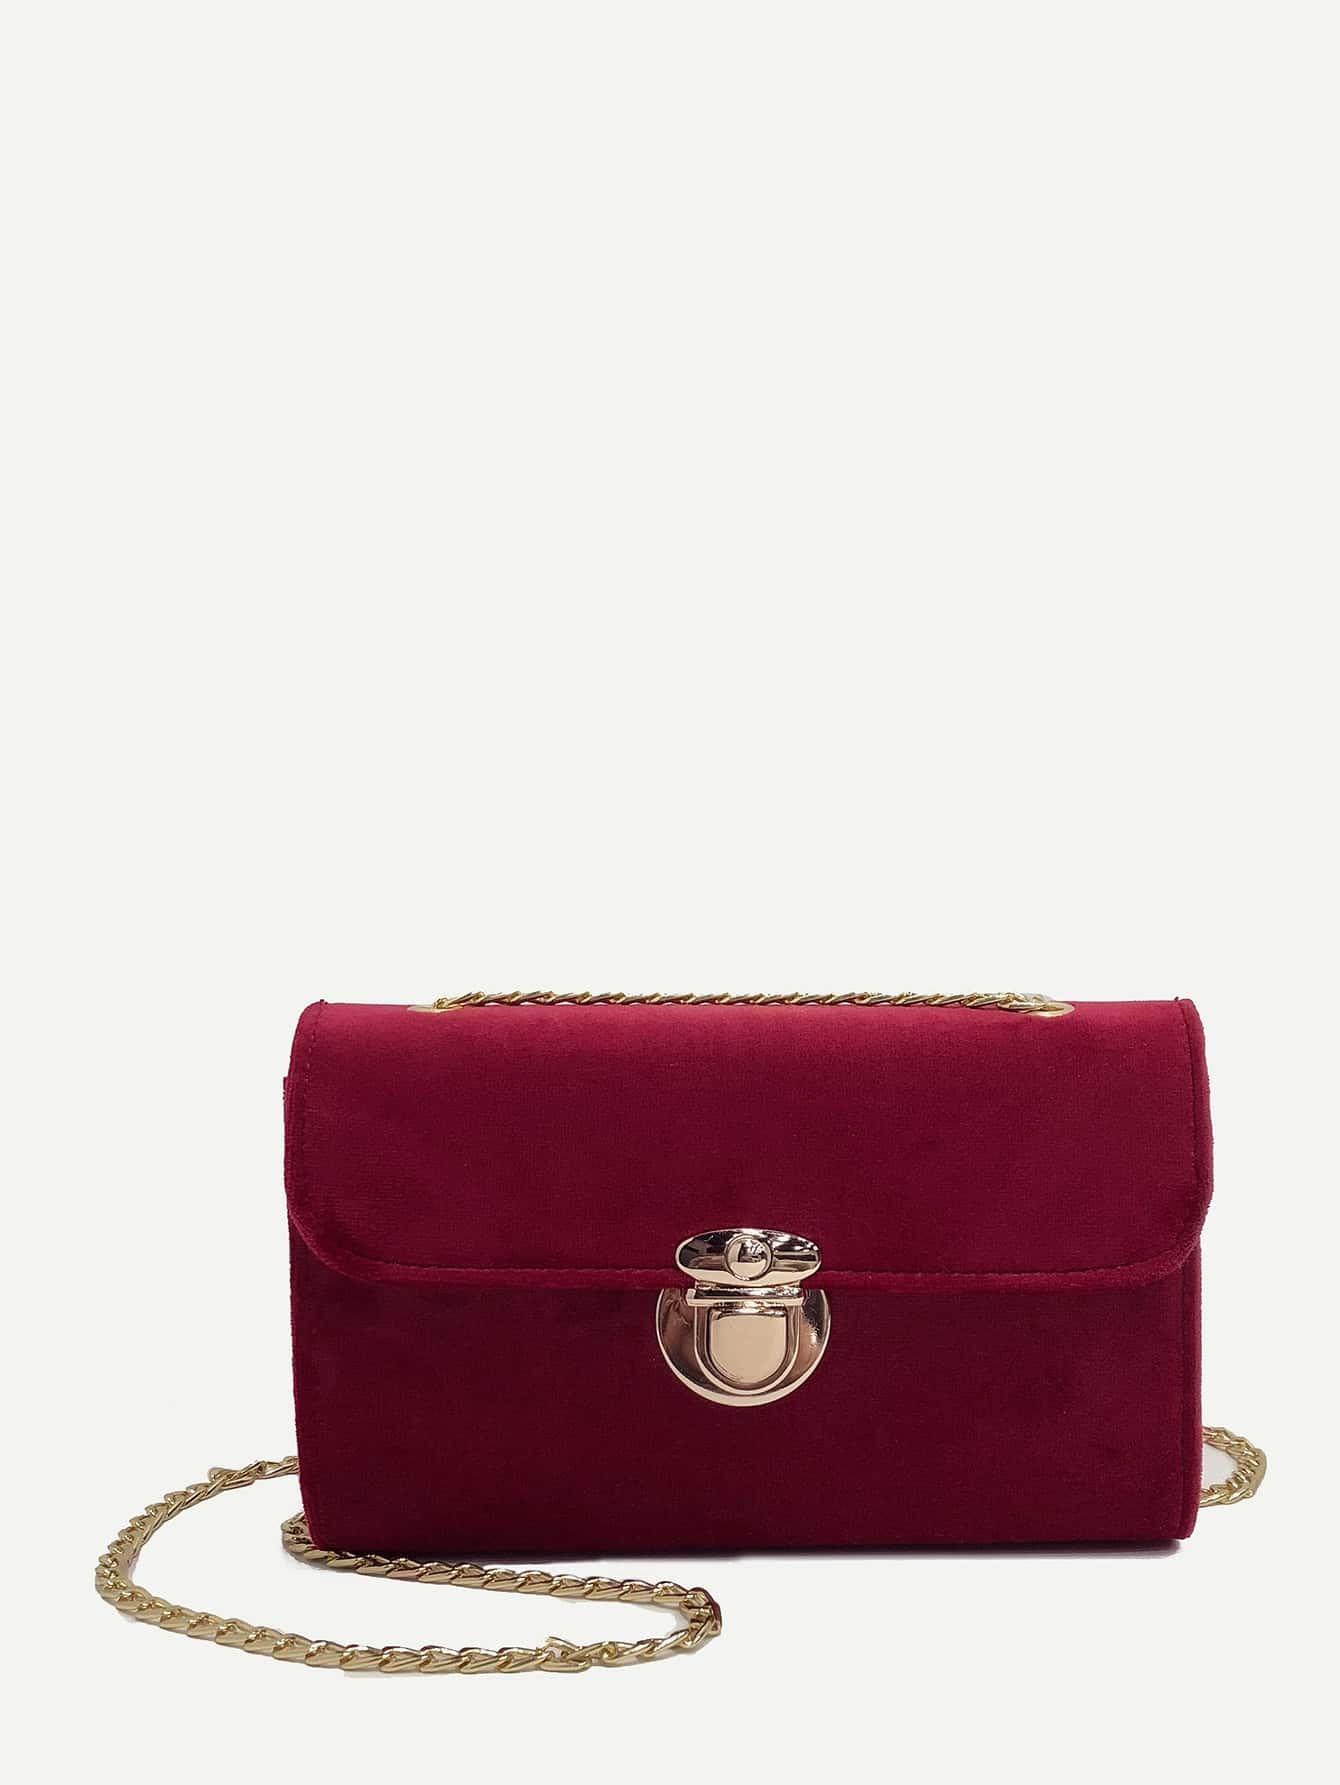 Push Lock Suede Chain Shoulder Bag